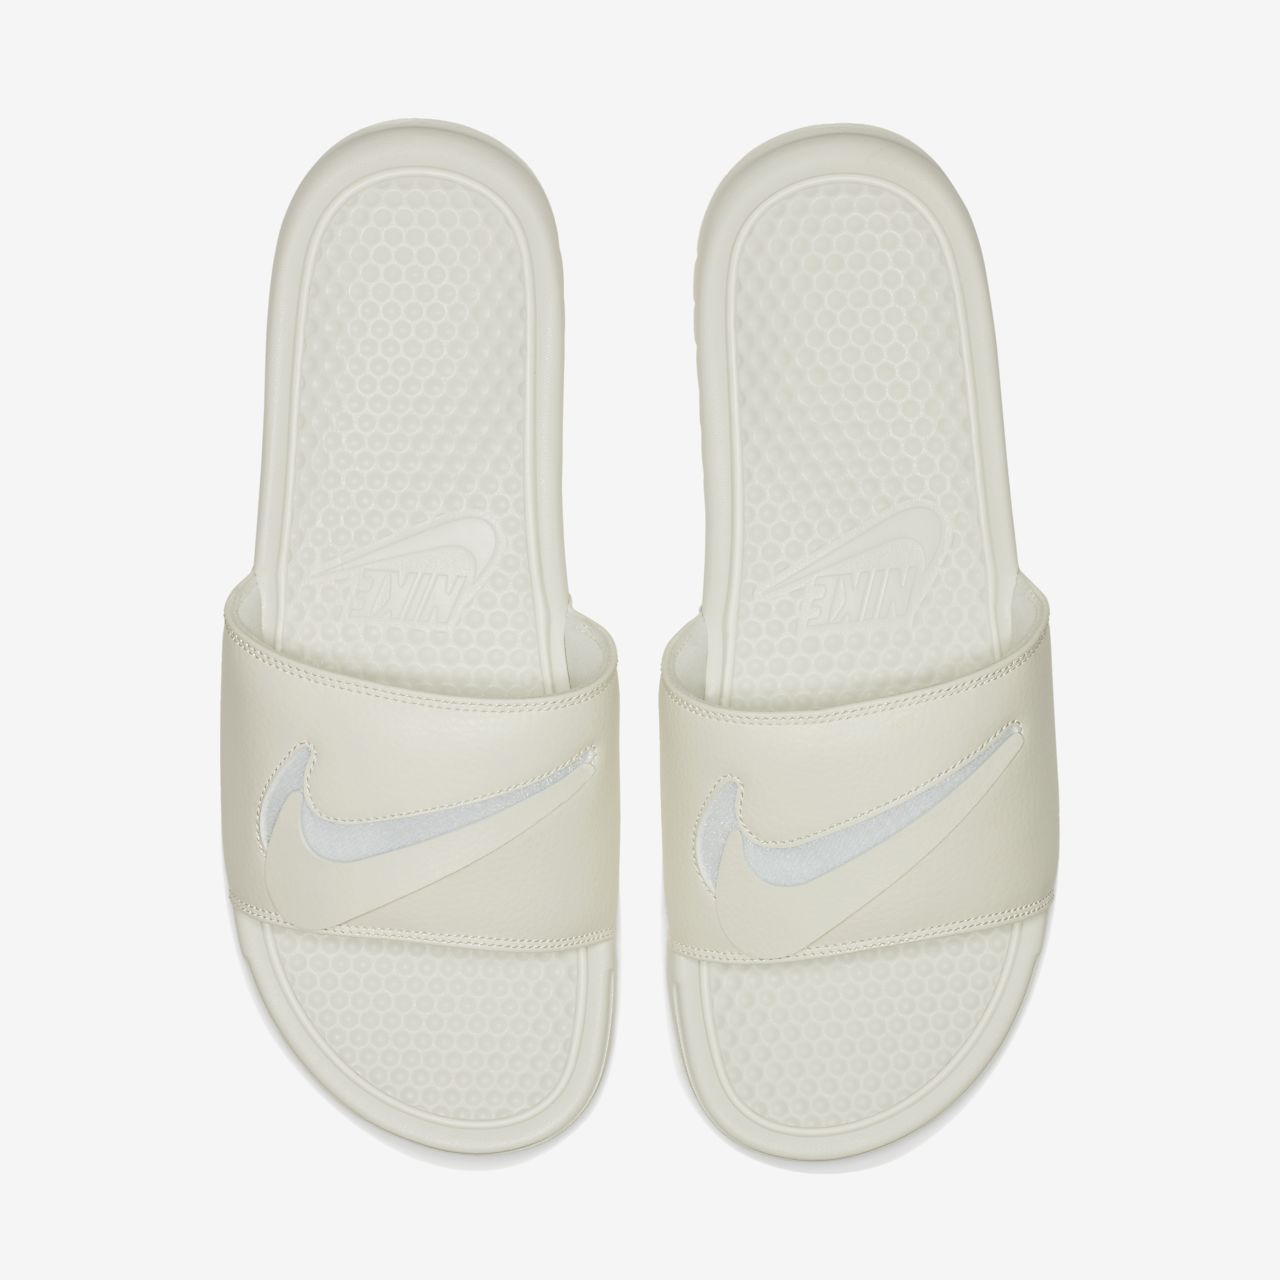 871b1667cdd Nike Benassi JDI LTD Men s Slide